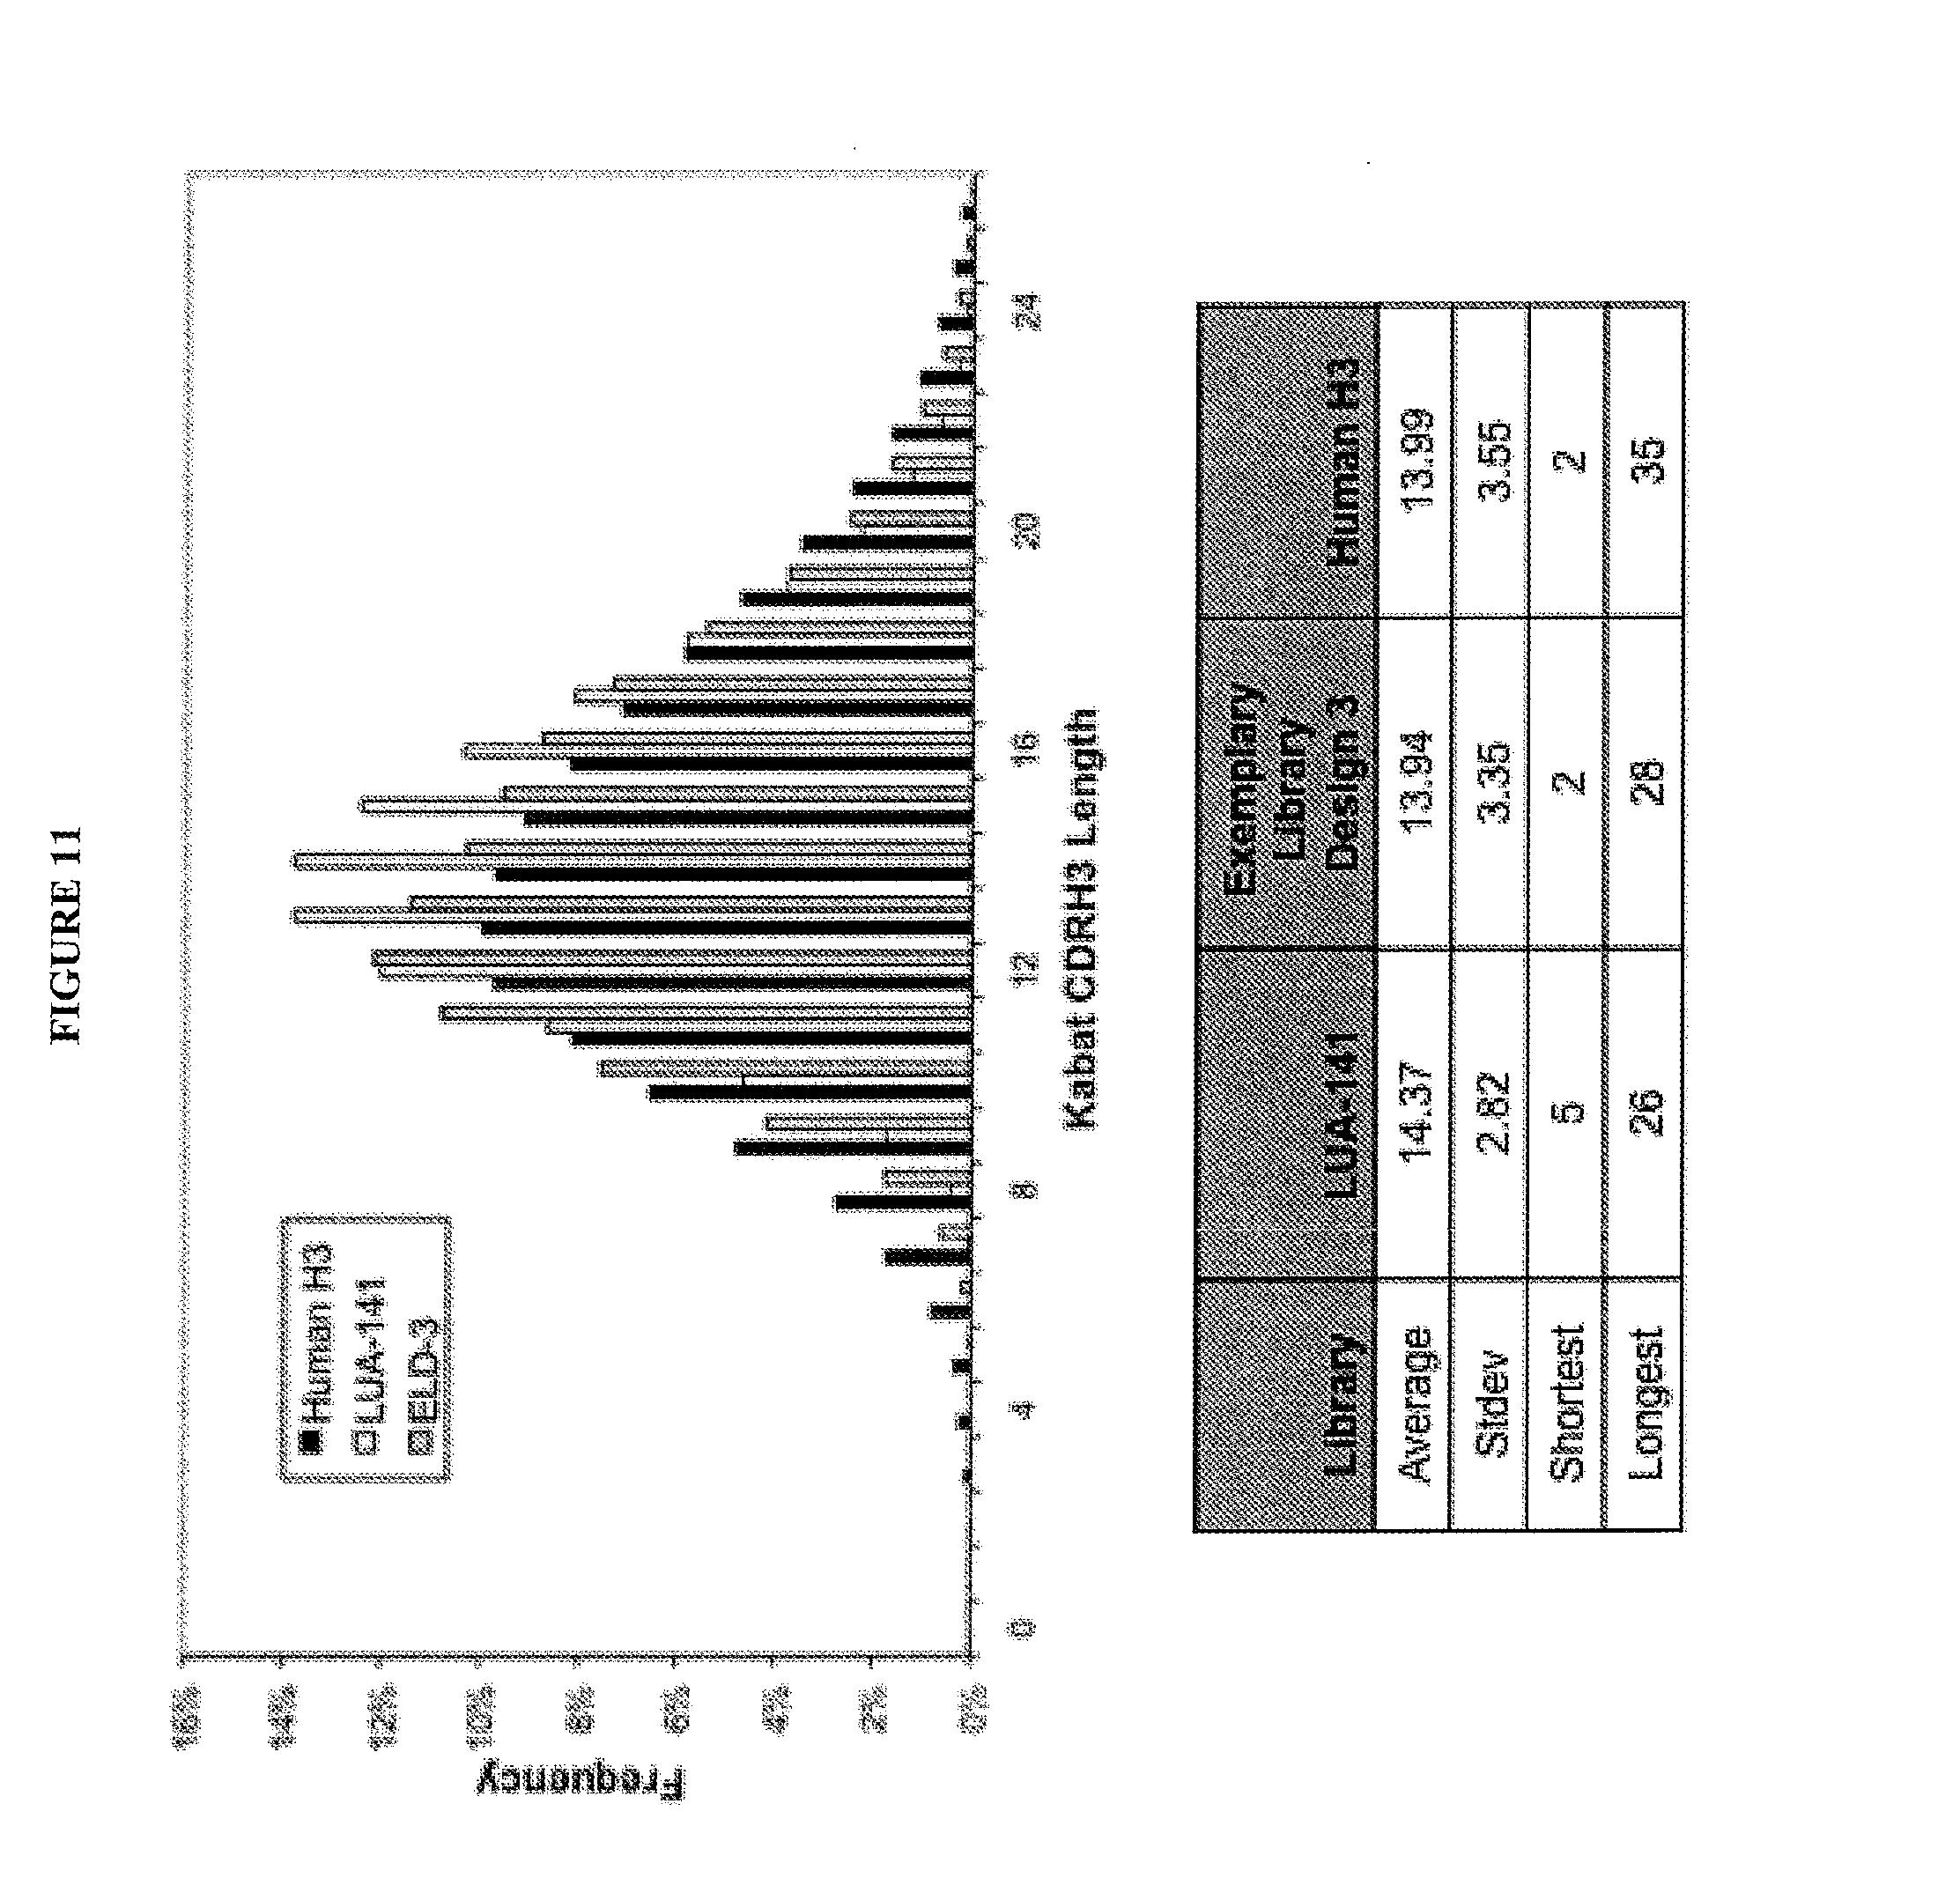 US20130197201A1 - Antibody libraries - Google Patents